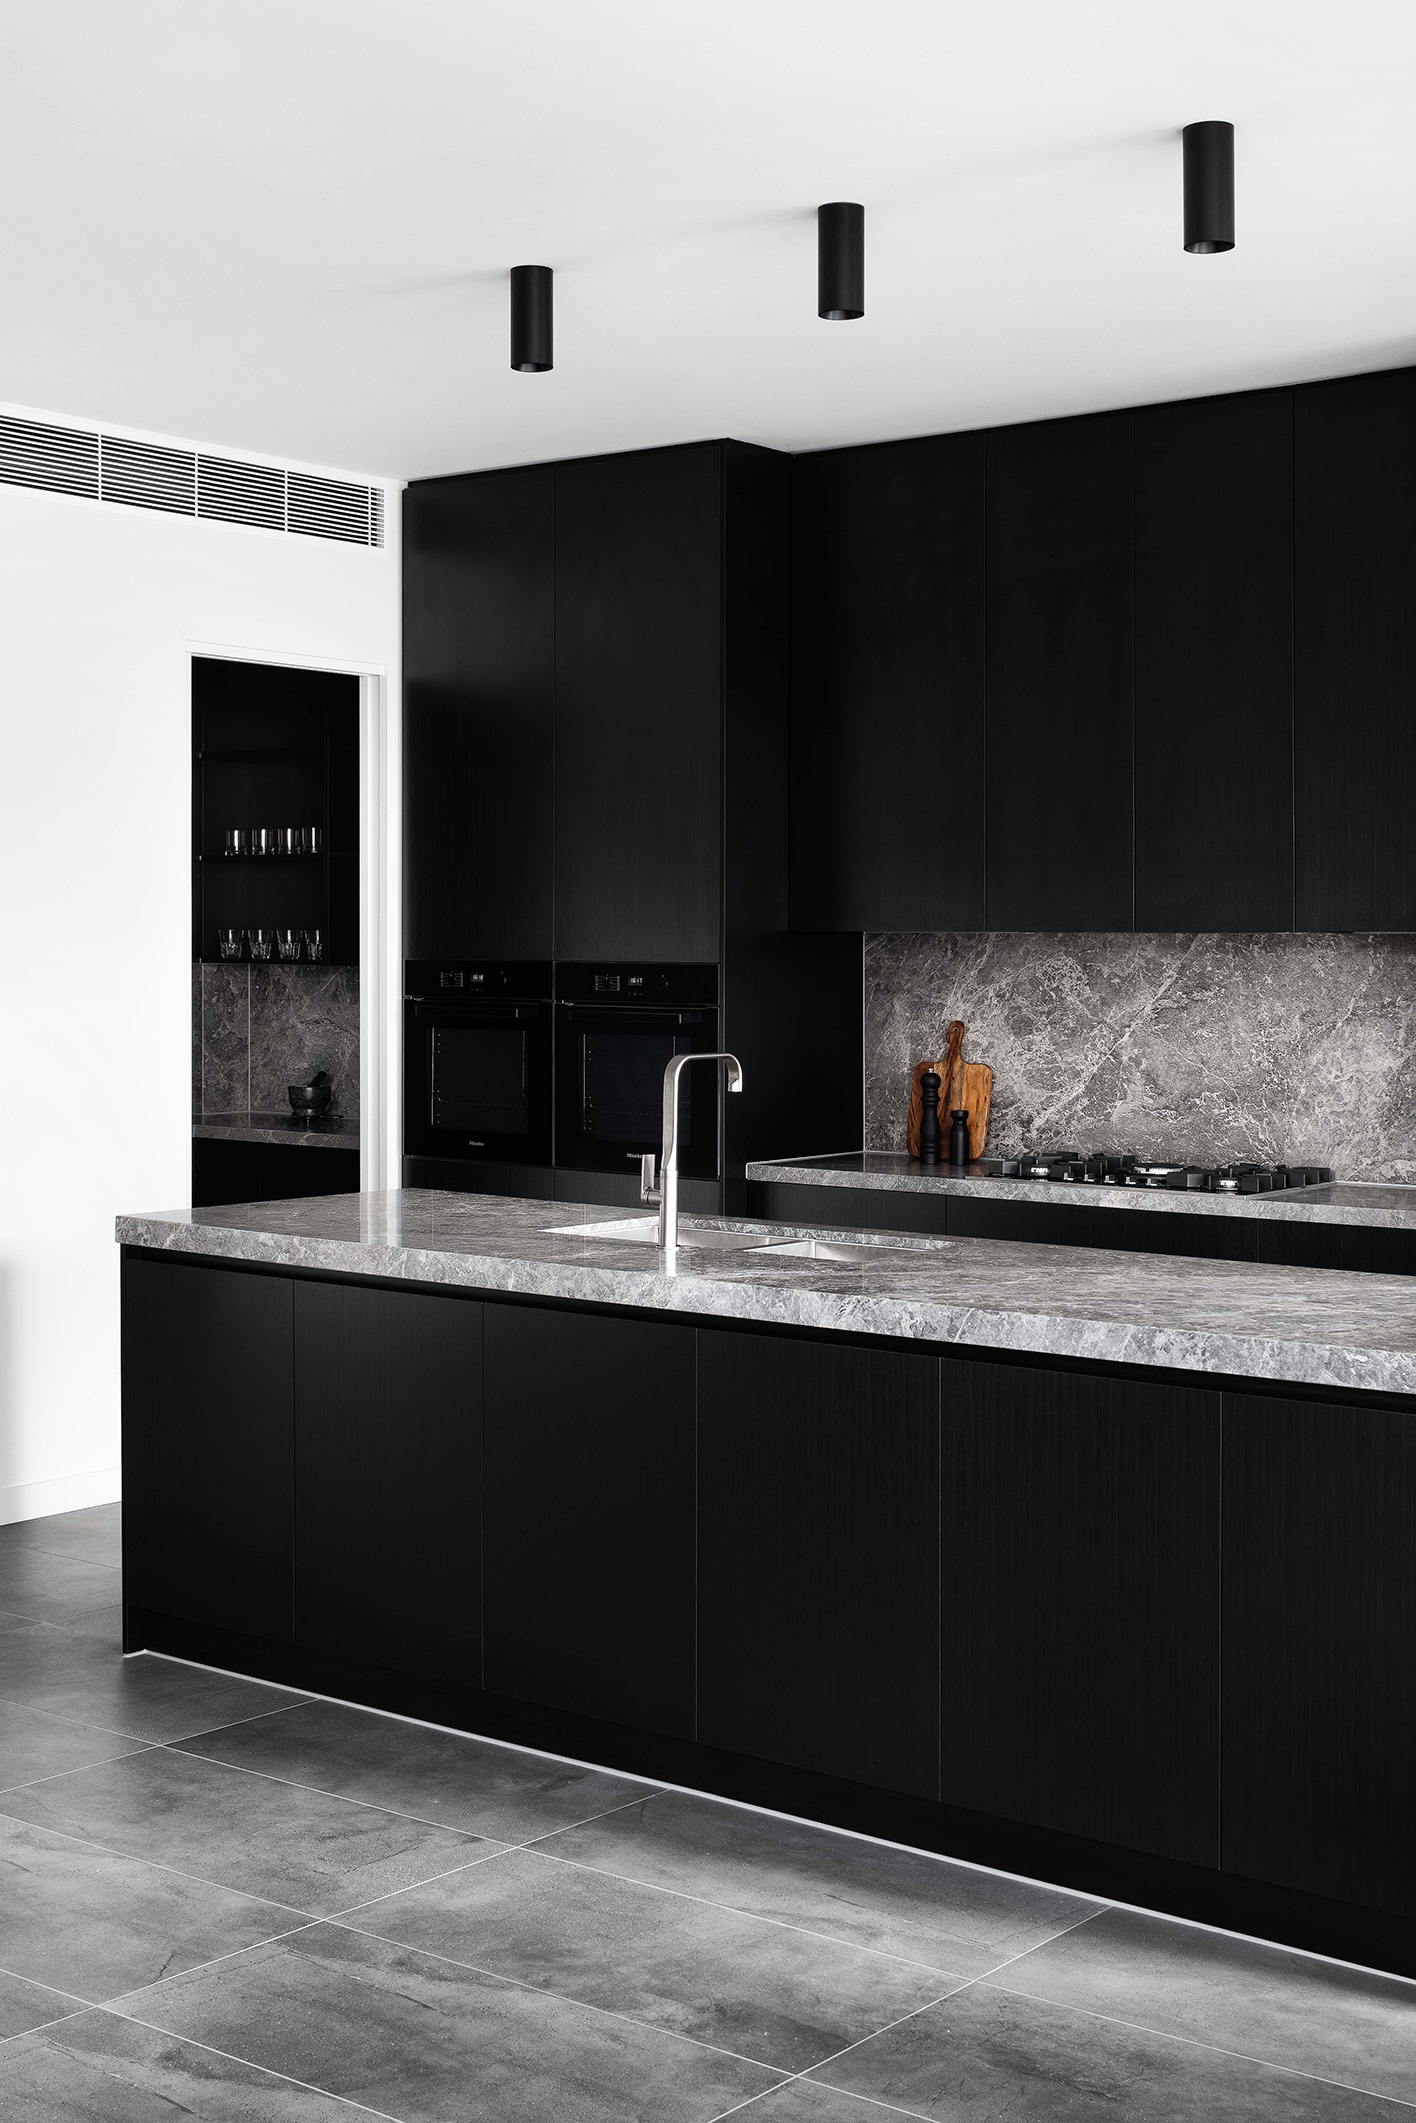 c.kairouz.architects-thornbury-townhouses-interior-kitchen-angle